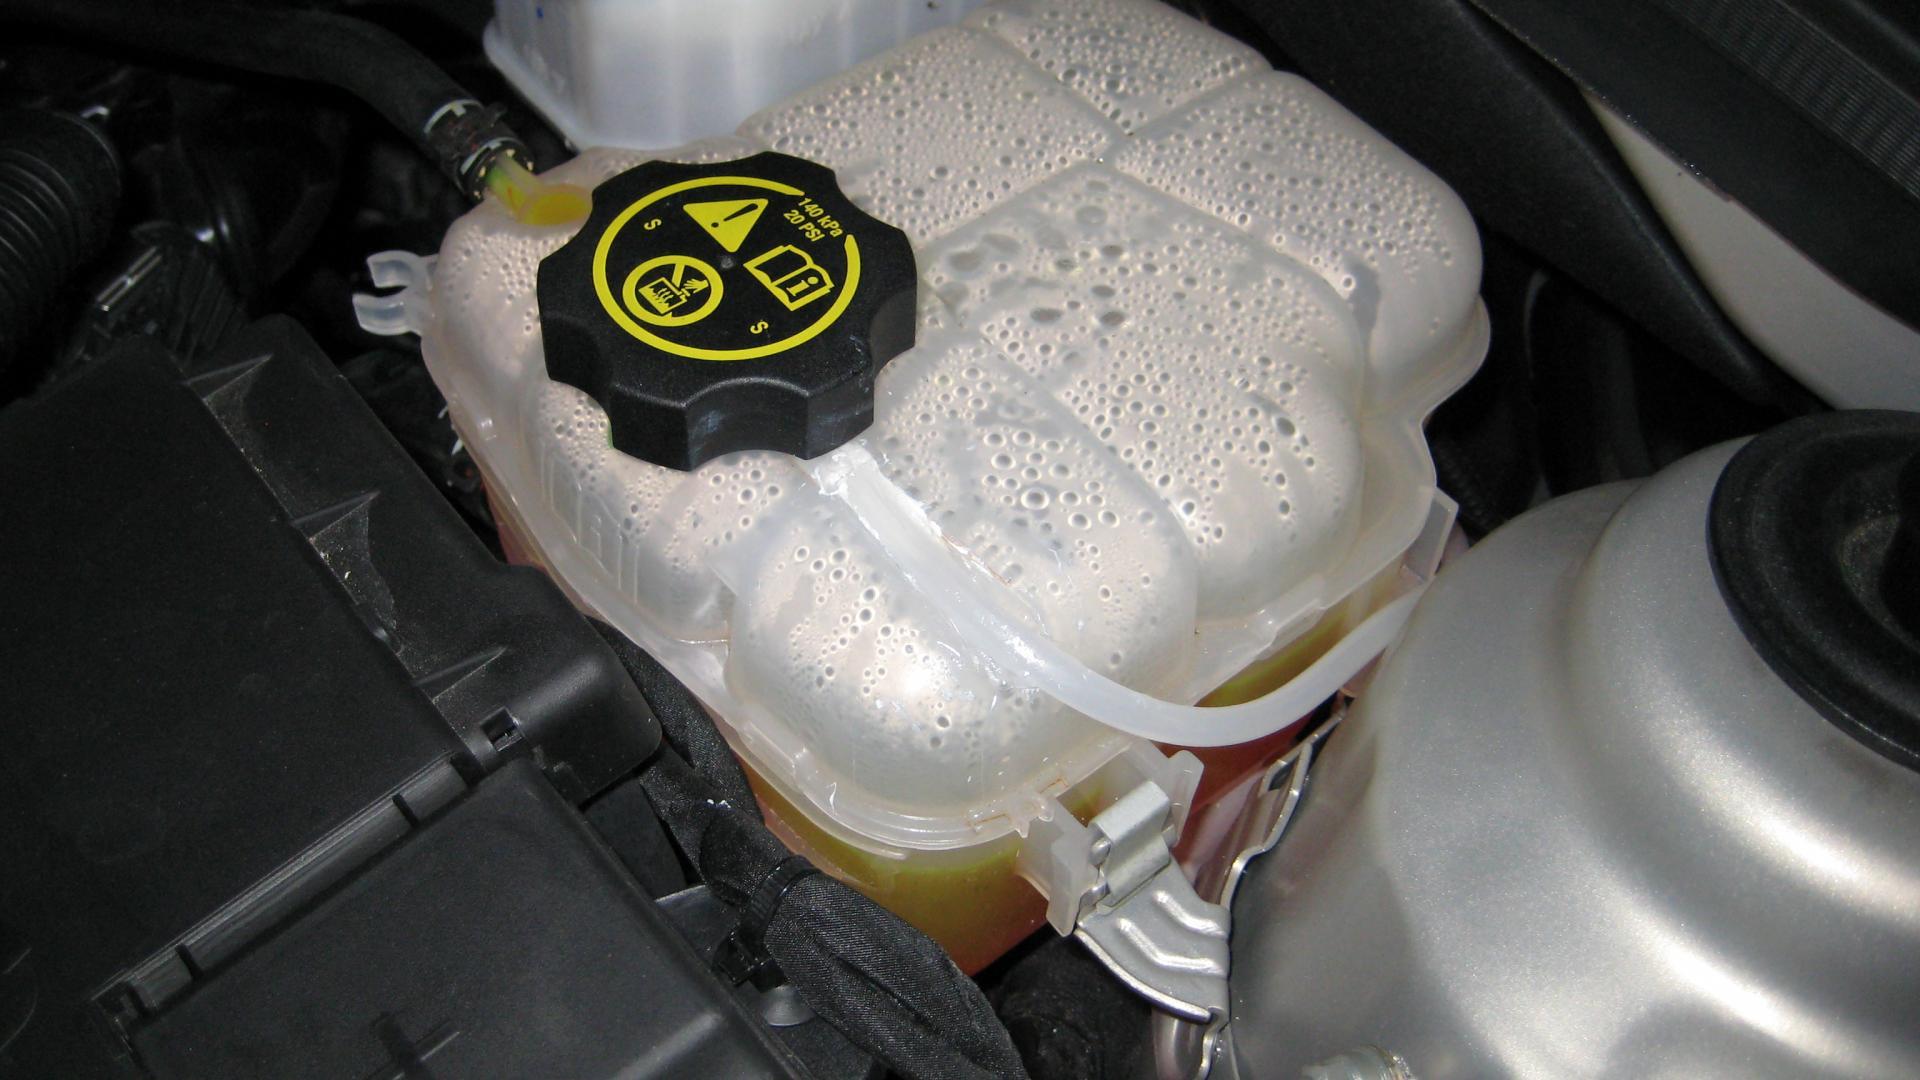 Smogteacher as well Gmc Topkick Chevy Kodiak Electronic Air Brake Control Module K besides Maxresdefault as well Original further Gmc Topkick Chevy Kodiak Electronic Air Brake Control Module. on 2012 chevy cruze coolant level